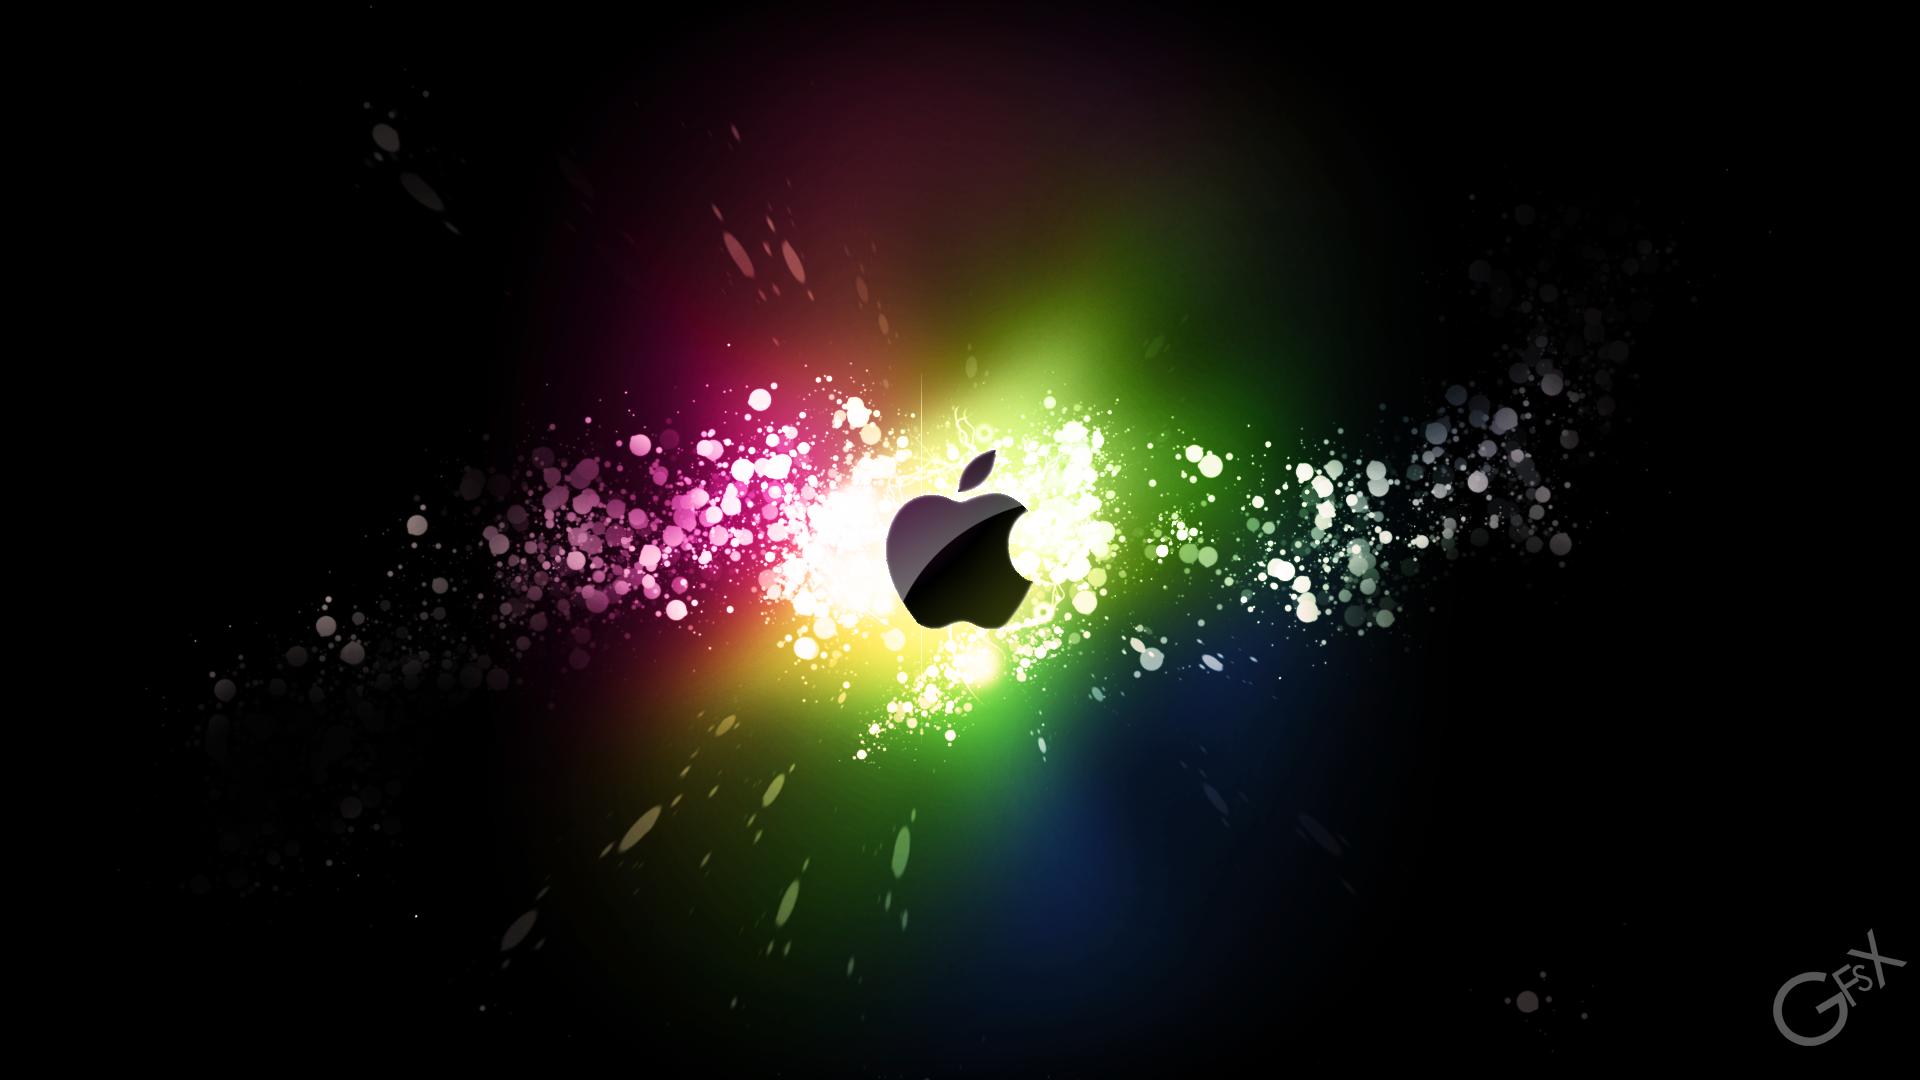 50 Music Wallpaper For Ipad On Wallpapersafari: Mac Background Images